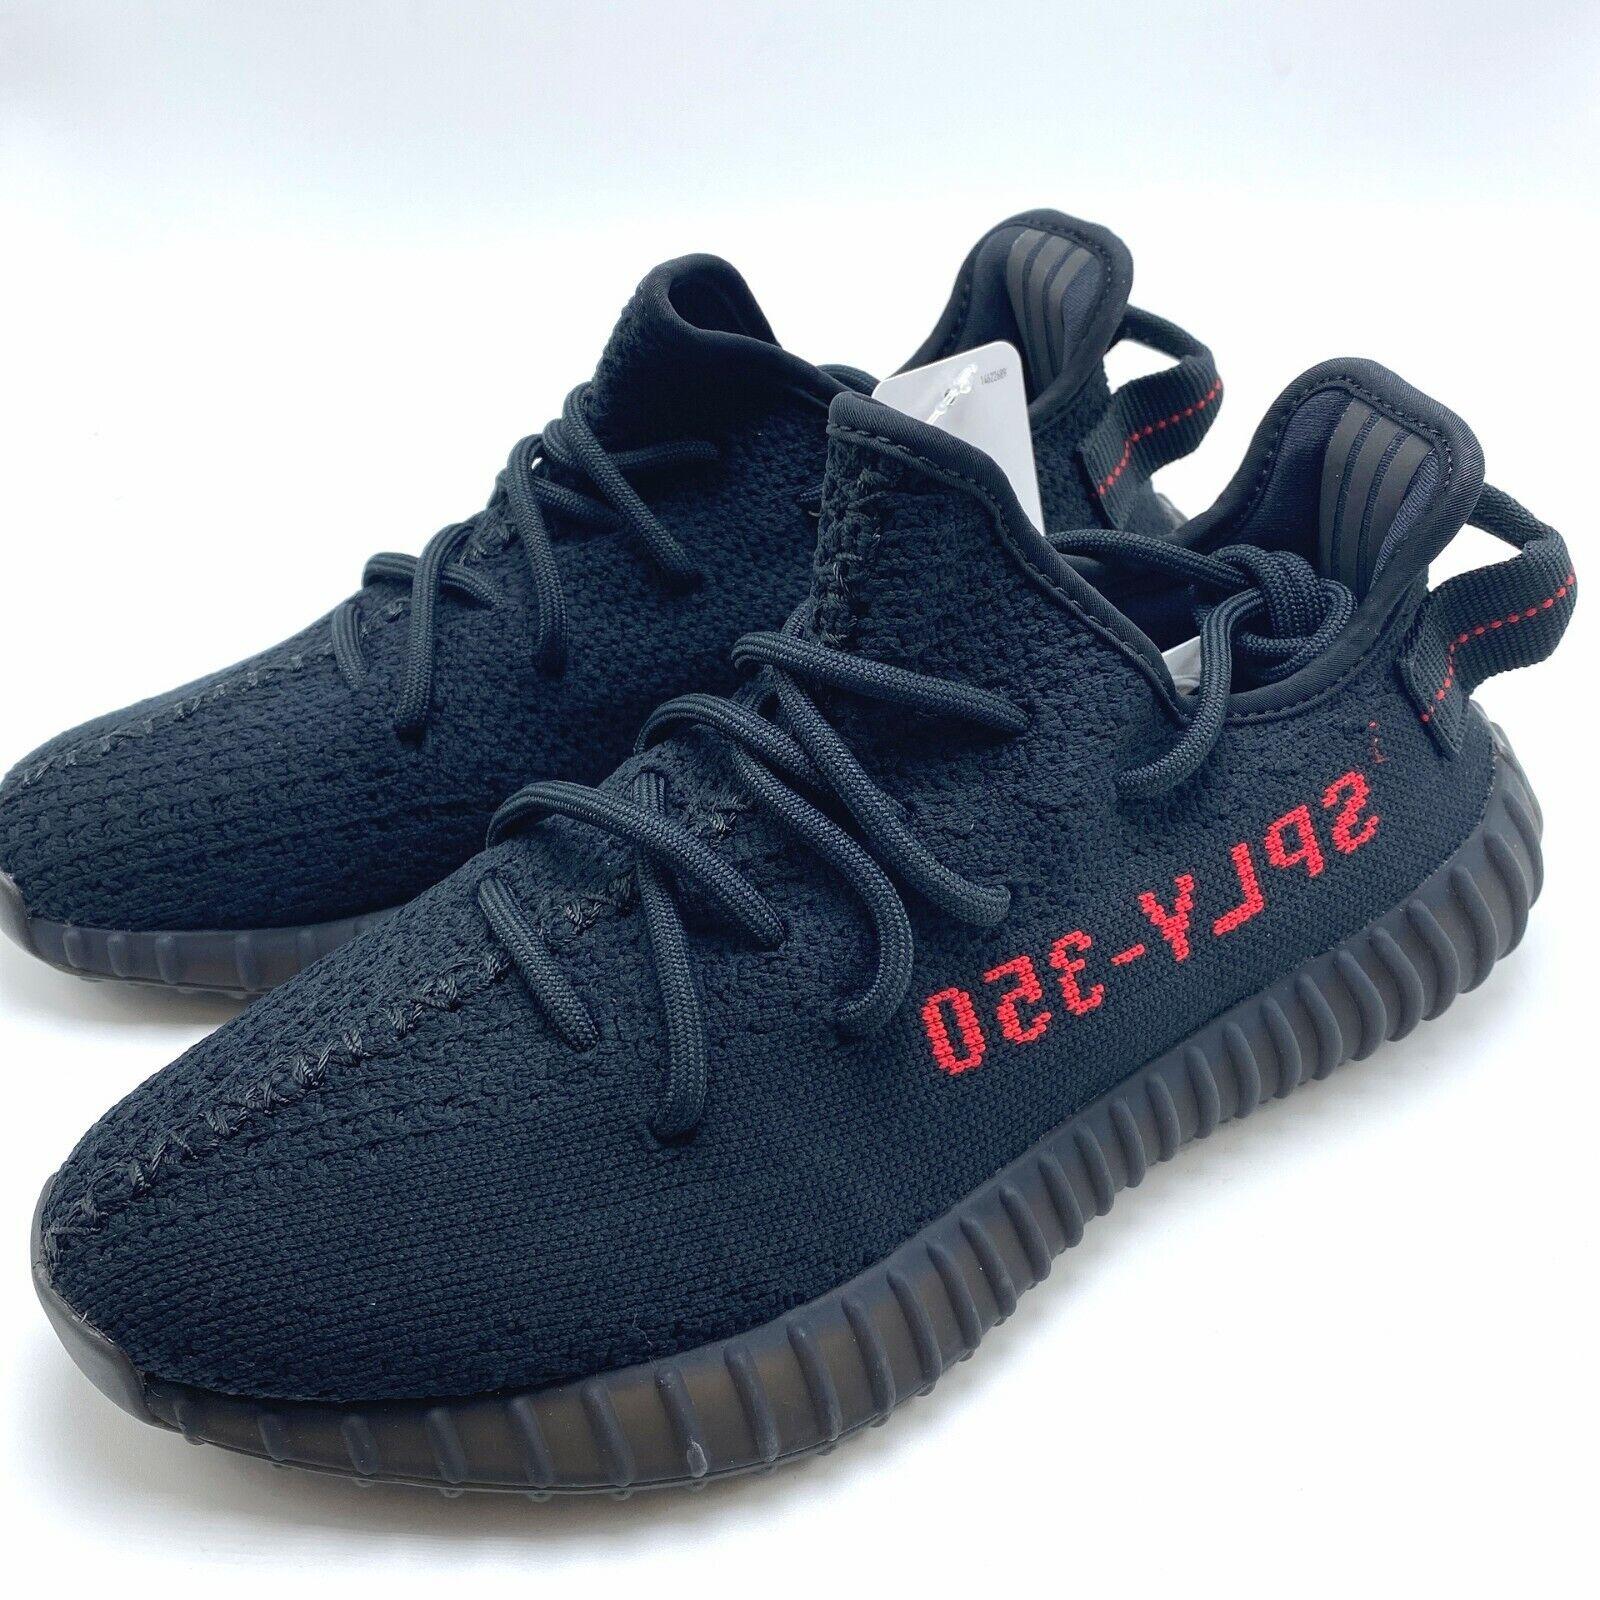 adidas yeezy boost 350 v2 bred